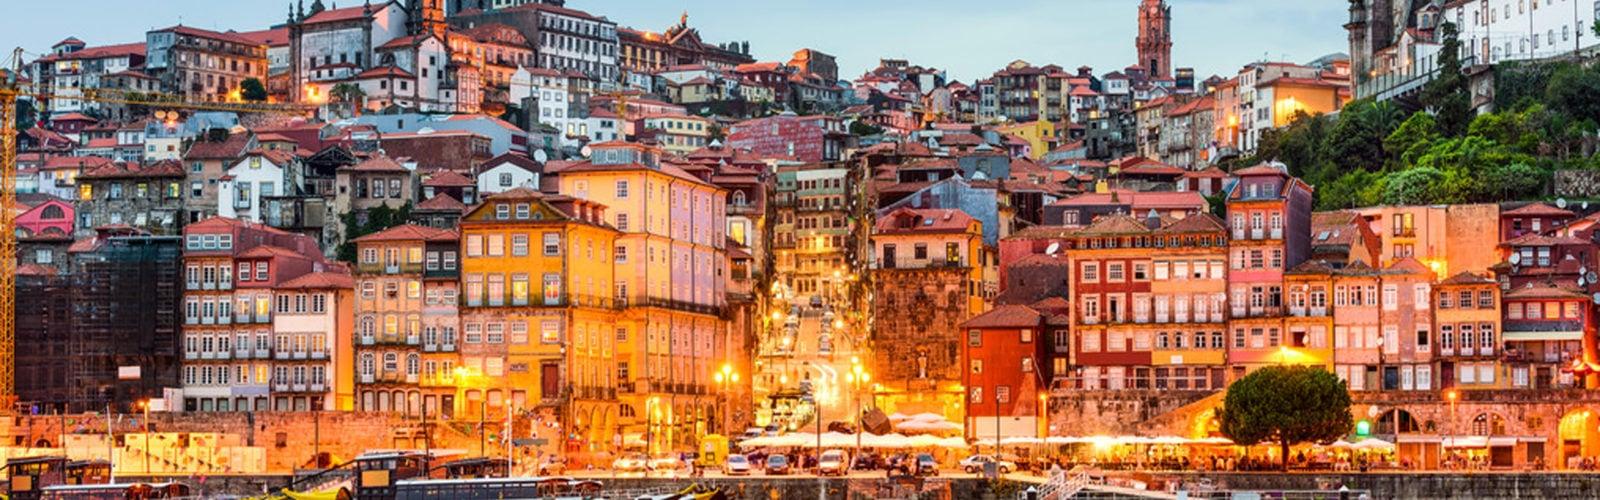 Porto-by-night